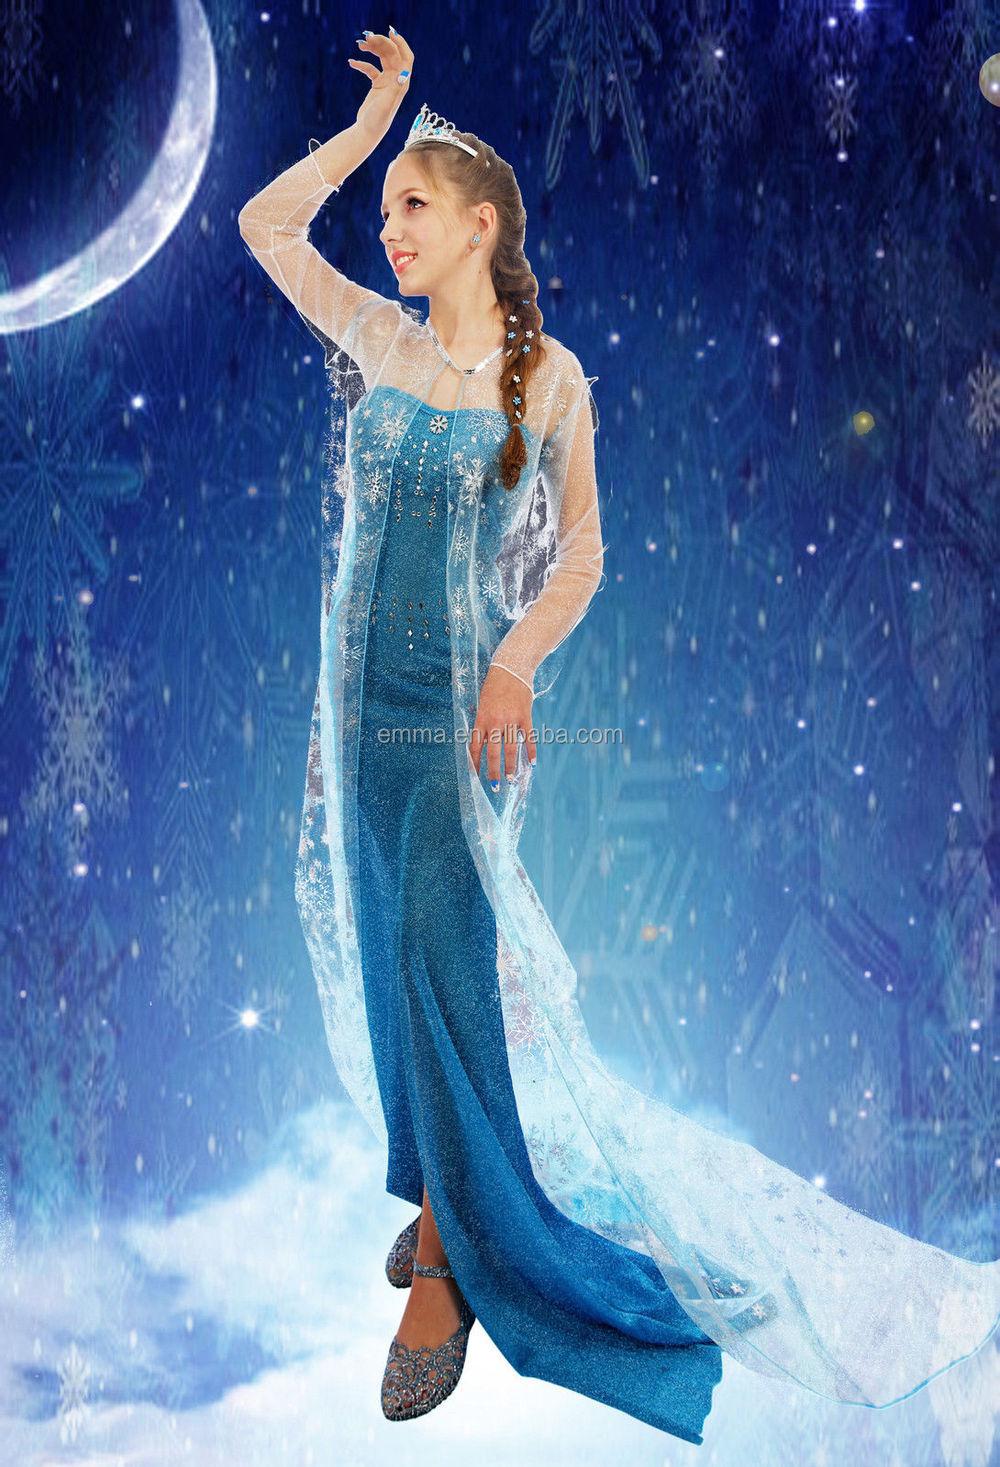 Adult Frozen Style Elsa Coronation Party Fancy Dress Princess Anna ...